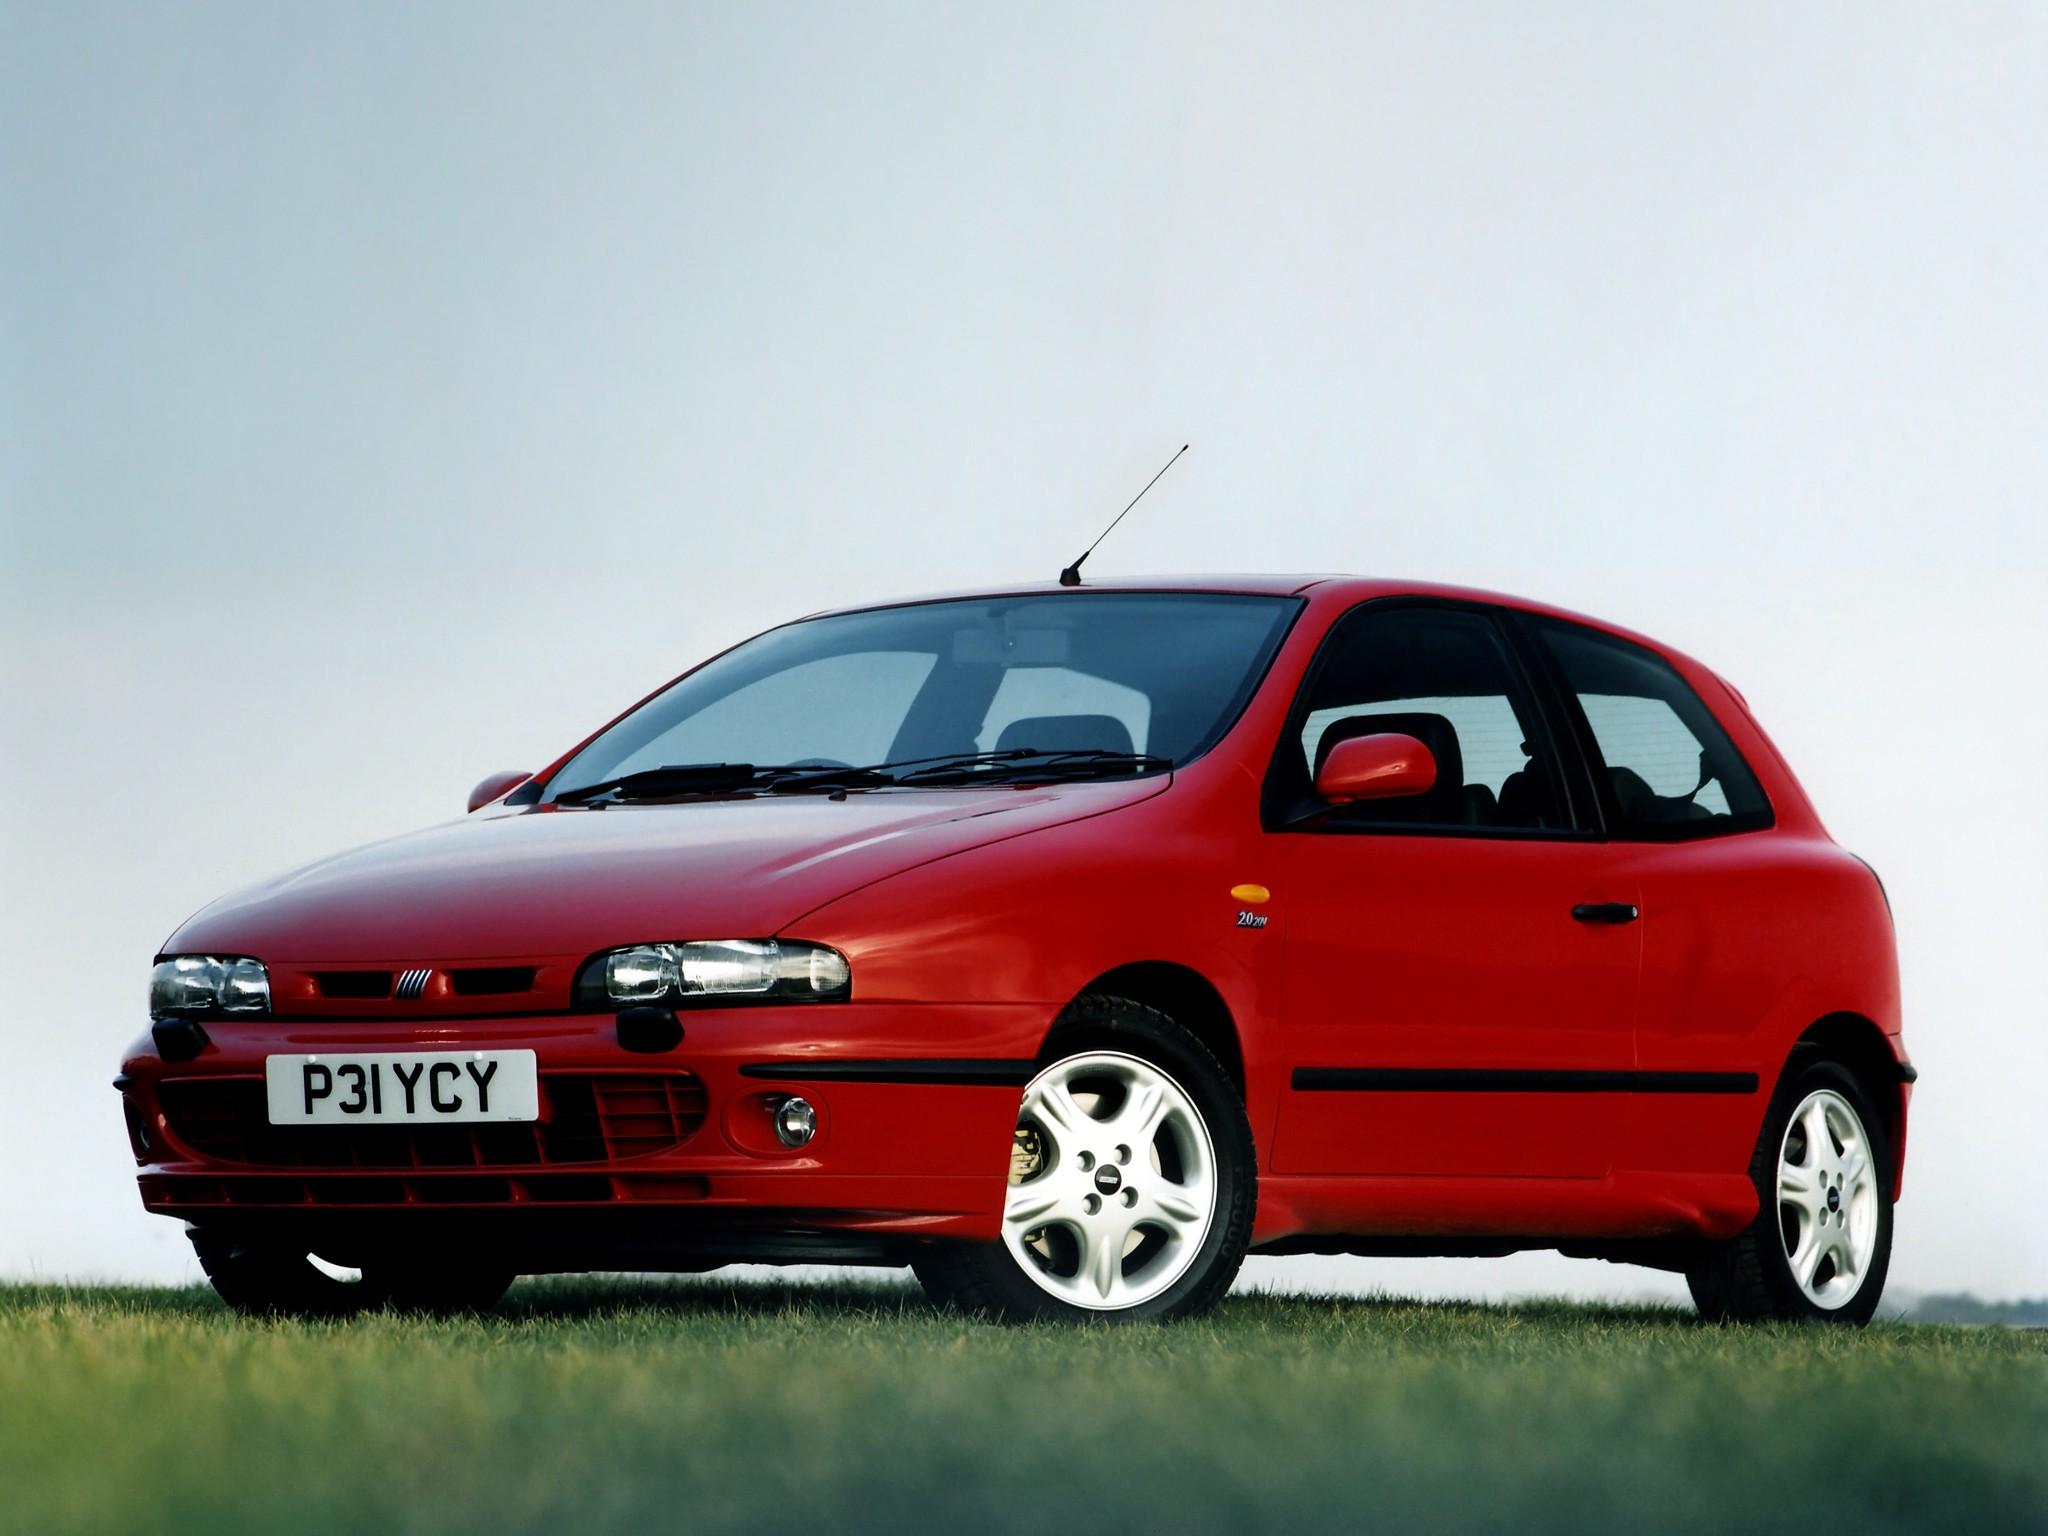 FIAT Bravo - 1995, 1996, 1997, 1998, 1999, 2000, 2001 ...